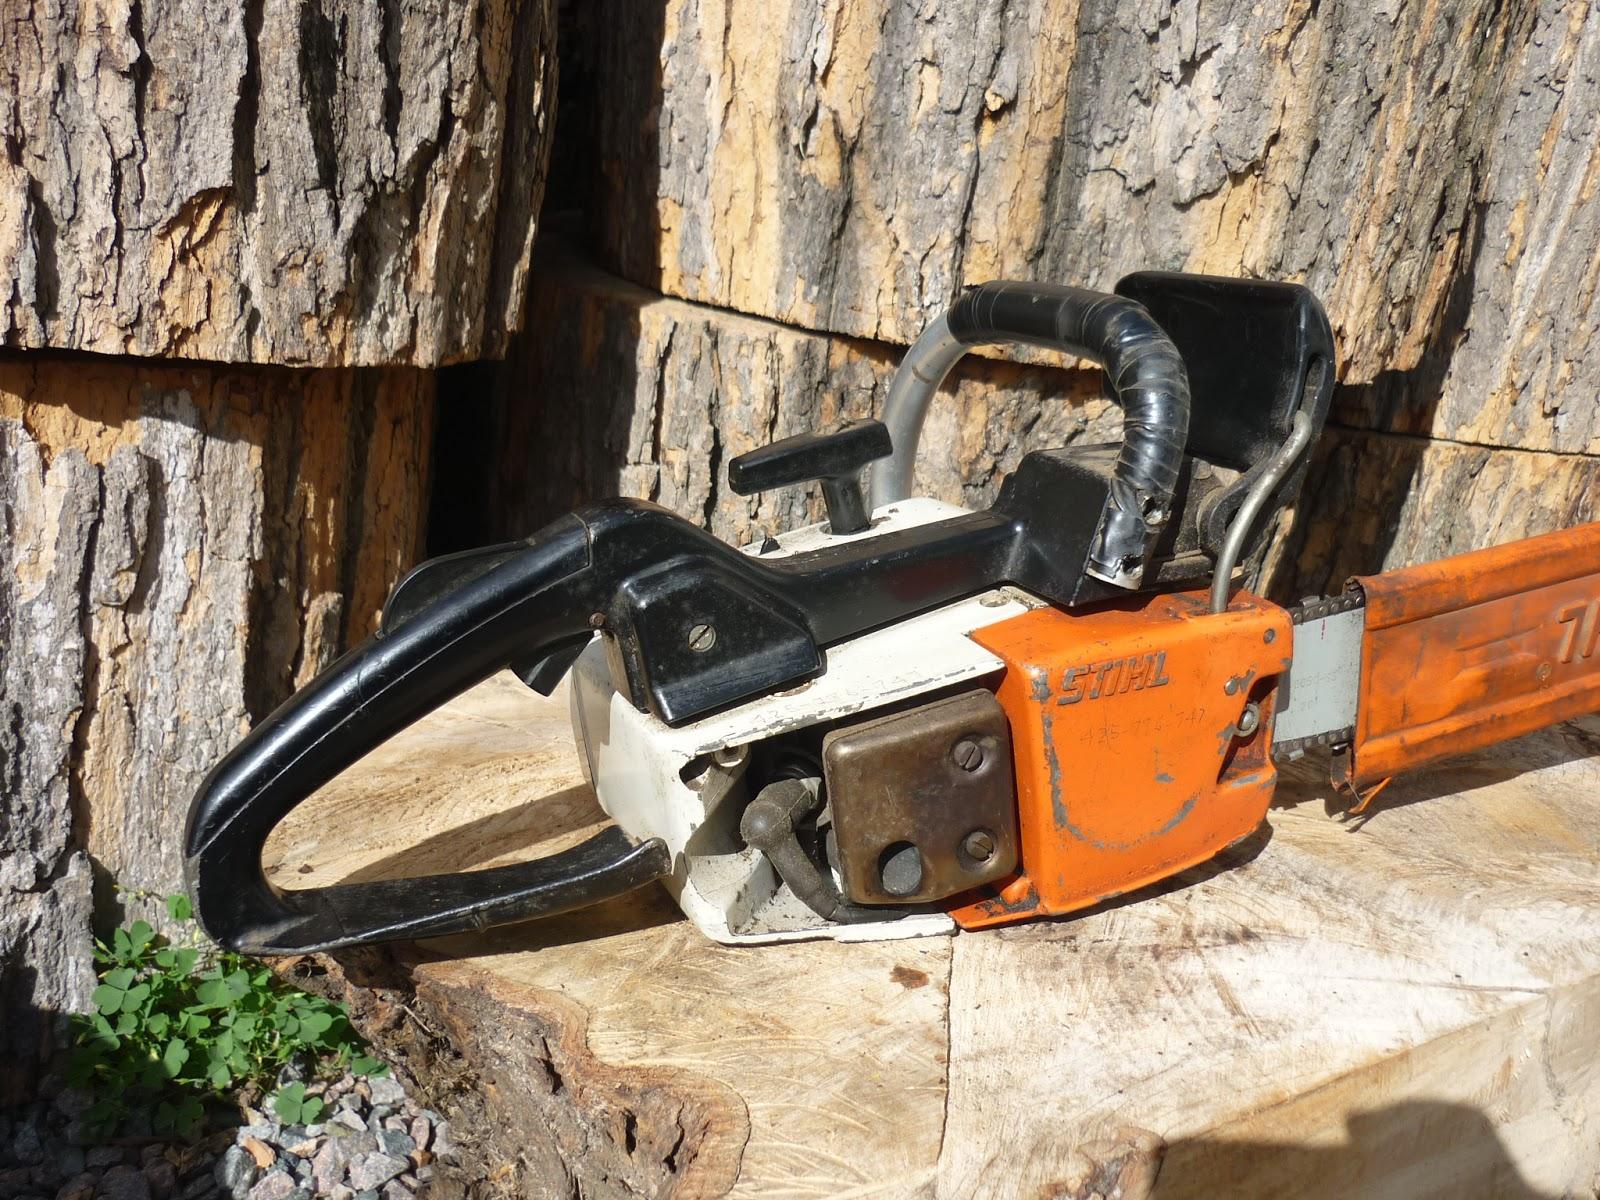 Vintage Chainsaw Collection Stihl 020 Avp